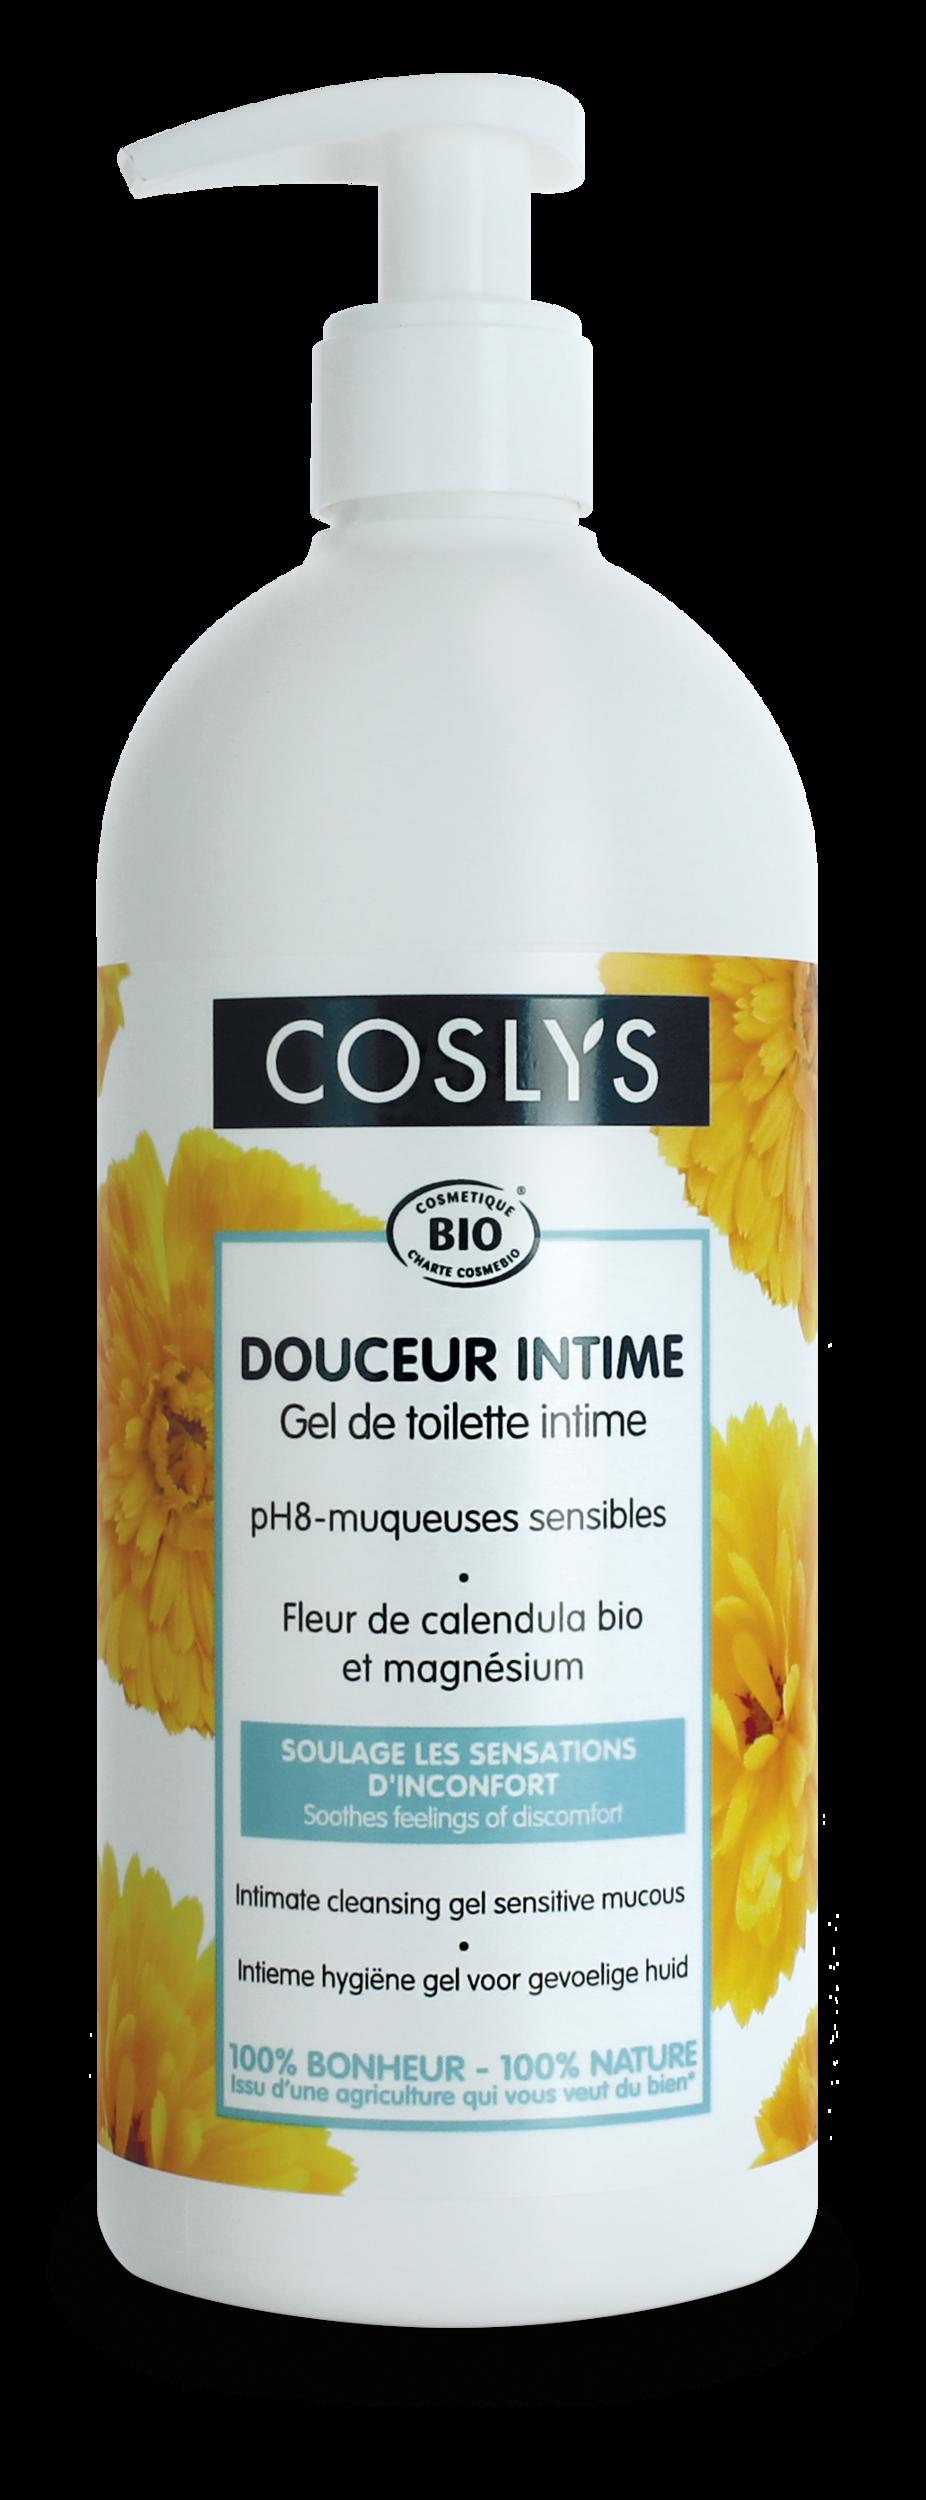 Coslys - Gel toilette intime ph8 muqueuses sensibles 500ml